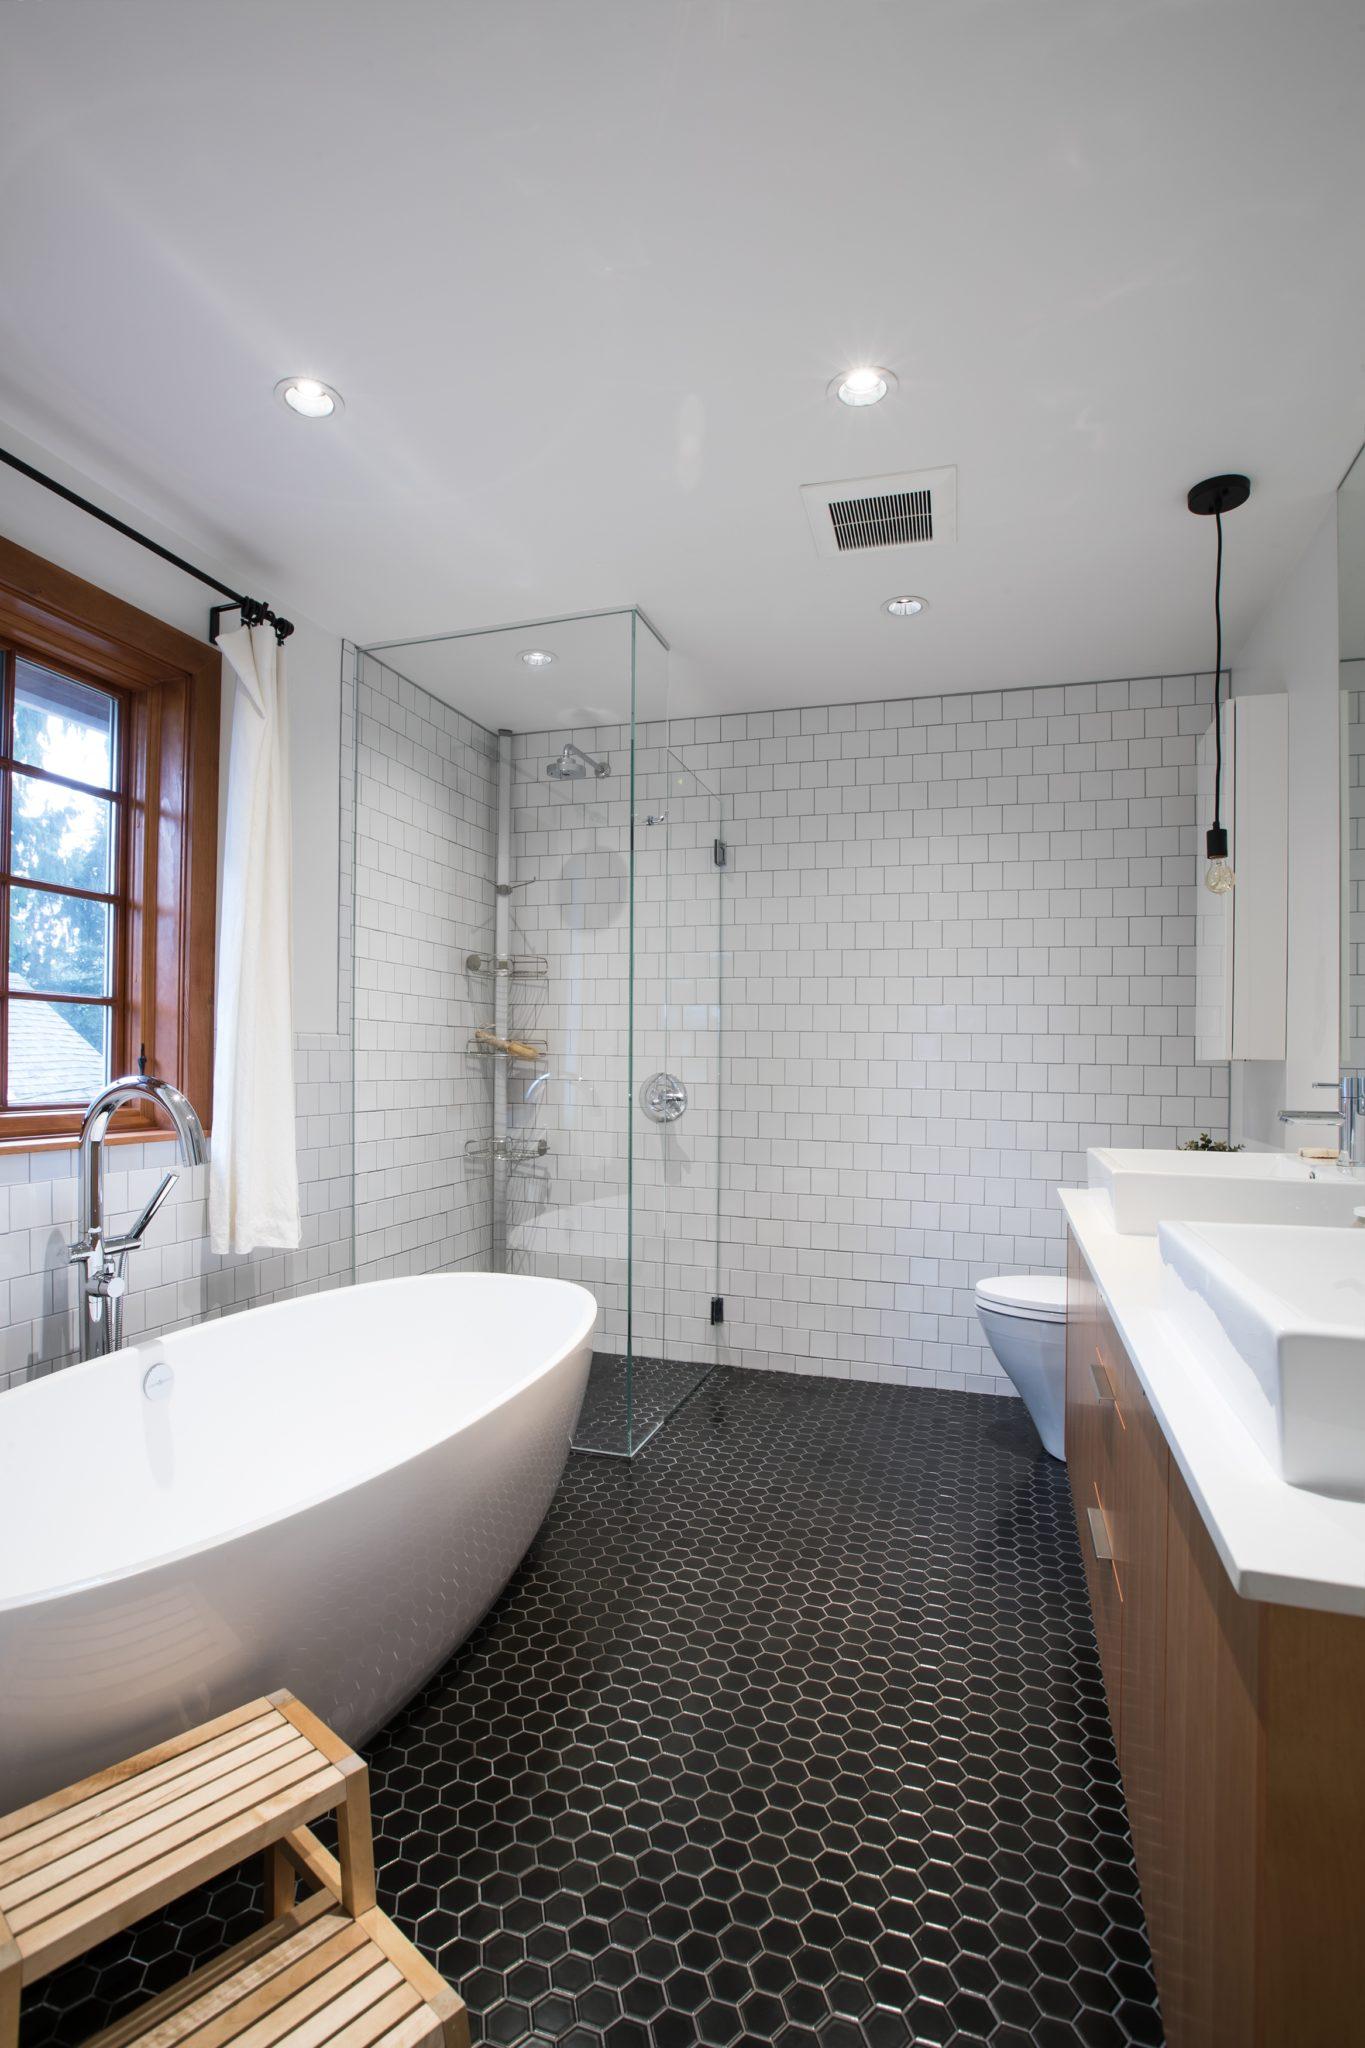 Tempe Heights residence - master bathroom with no-threshold shower by Corey Klassen Interior Design